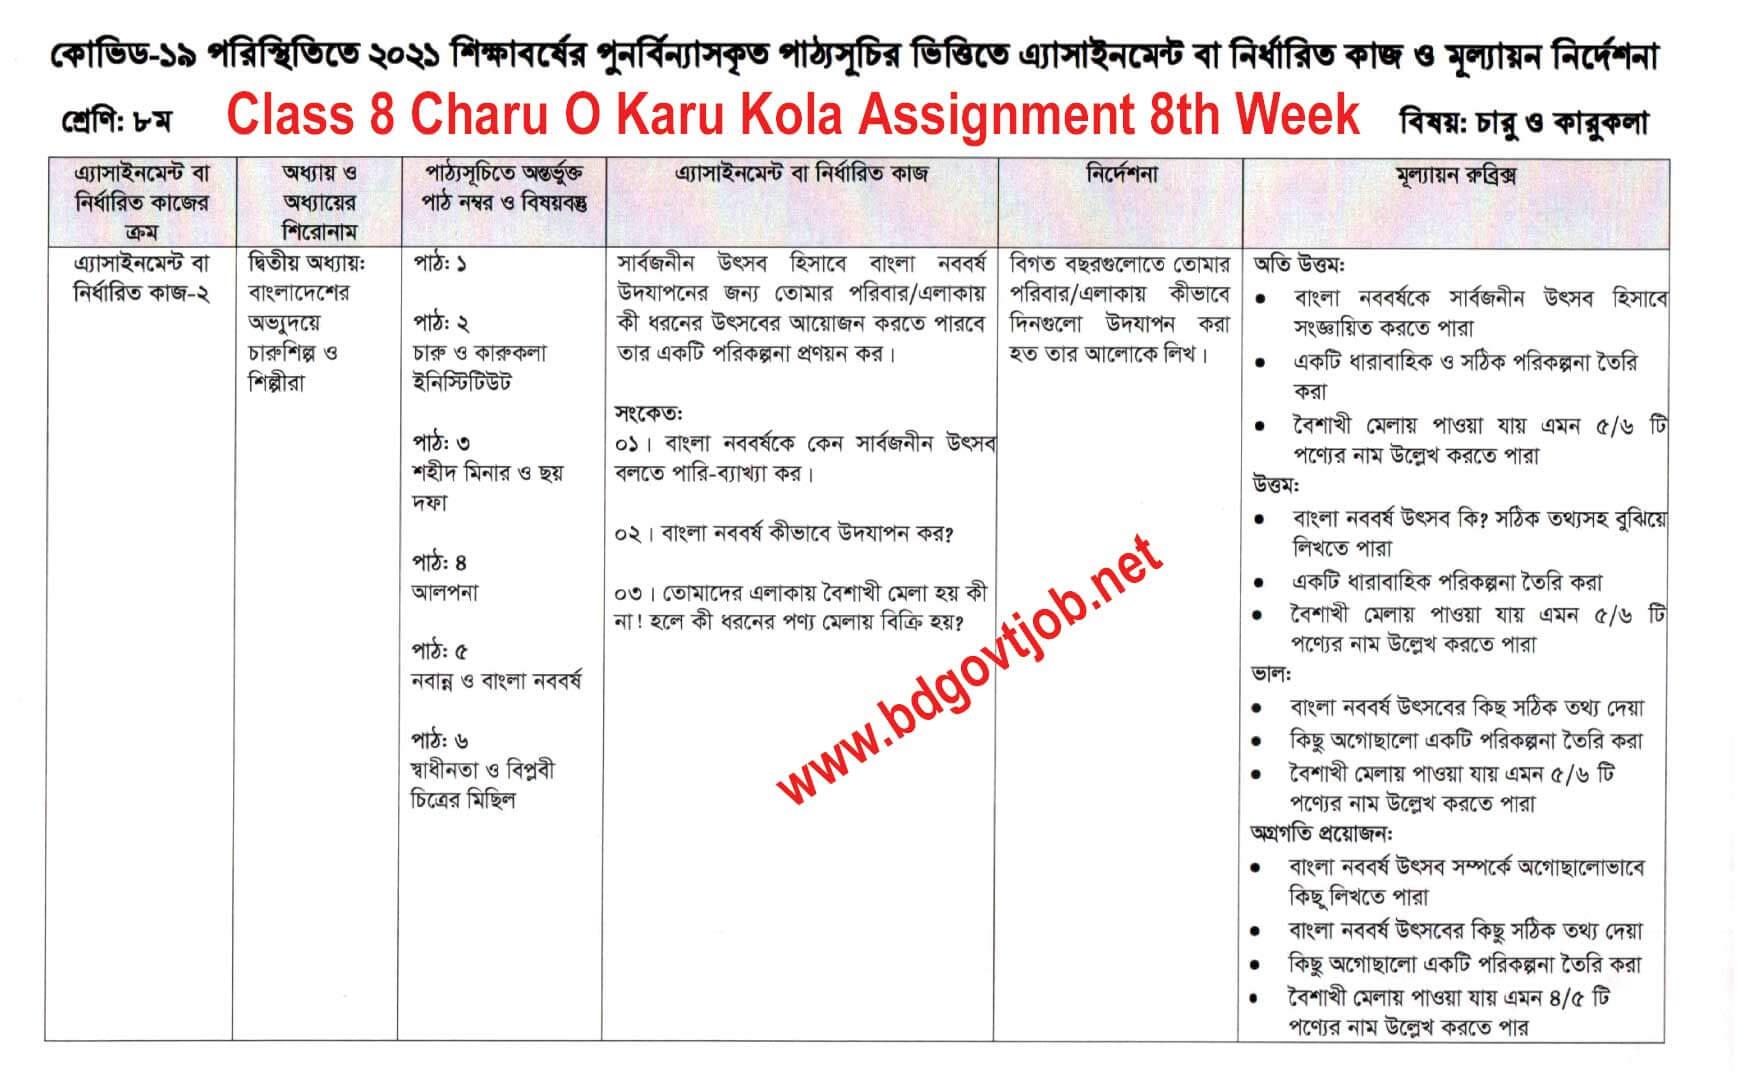 Class 8 Assignment Charu O Karukola